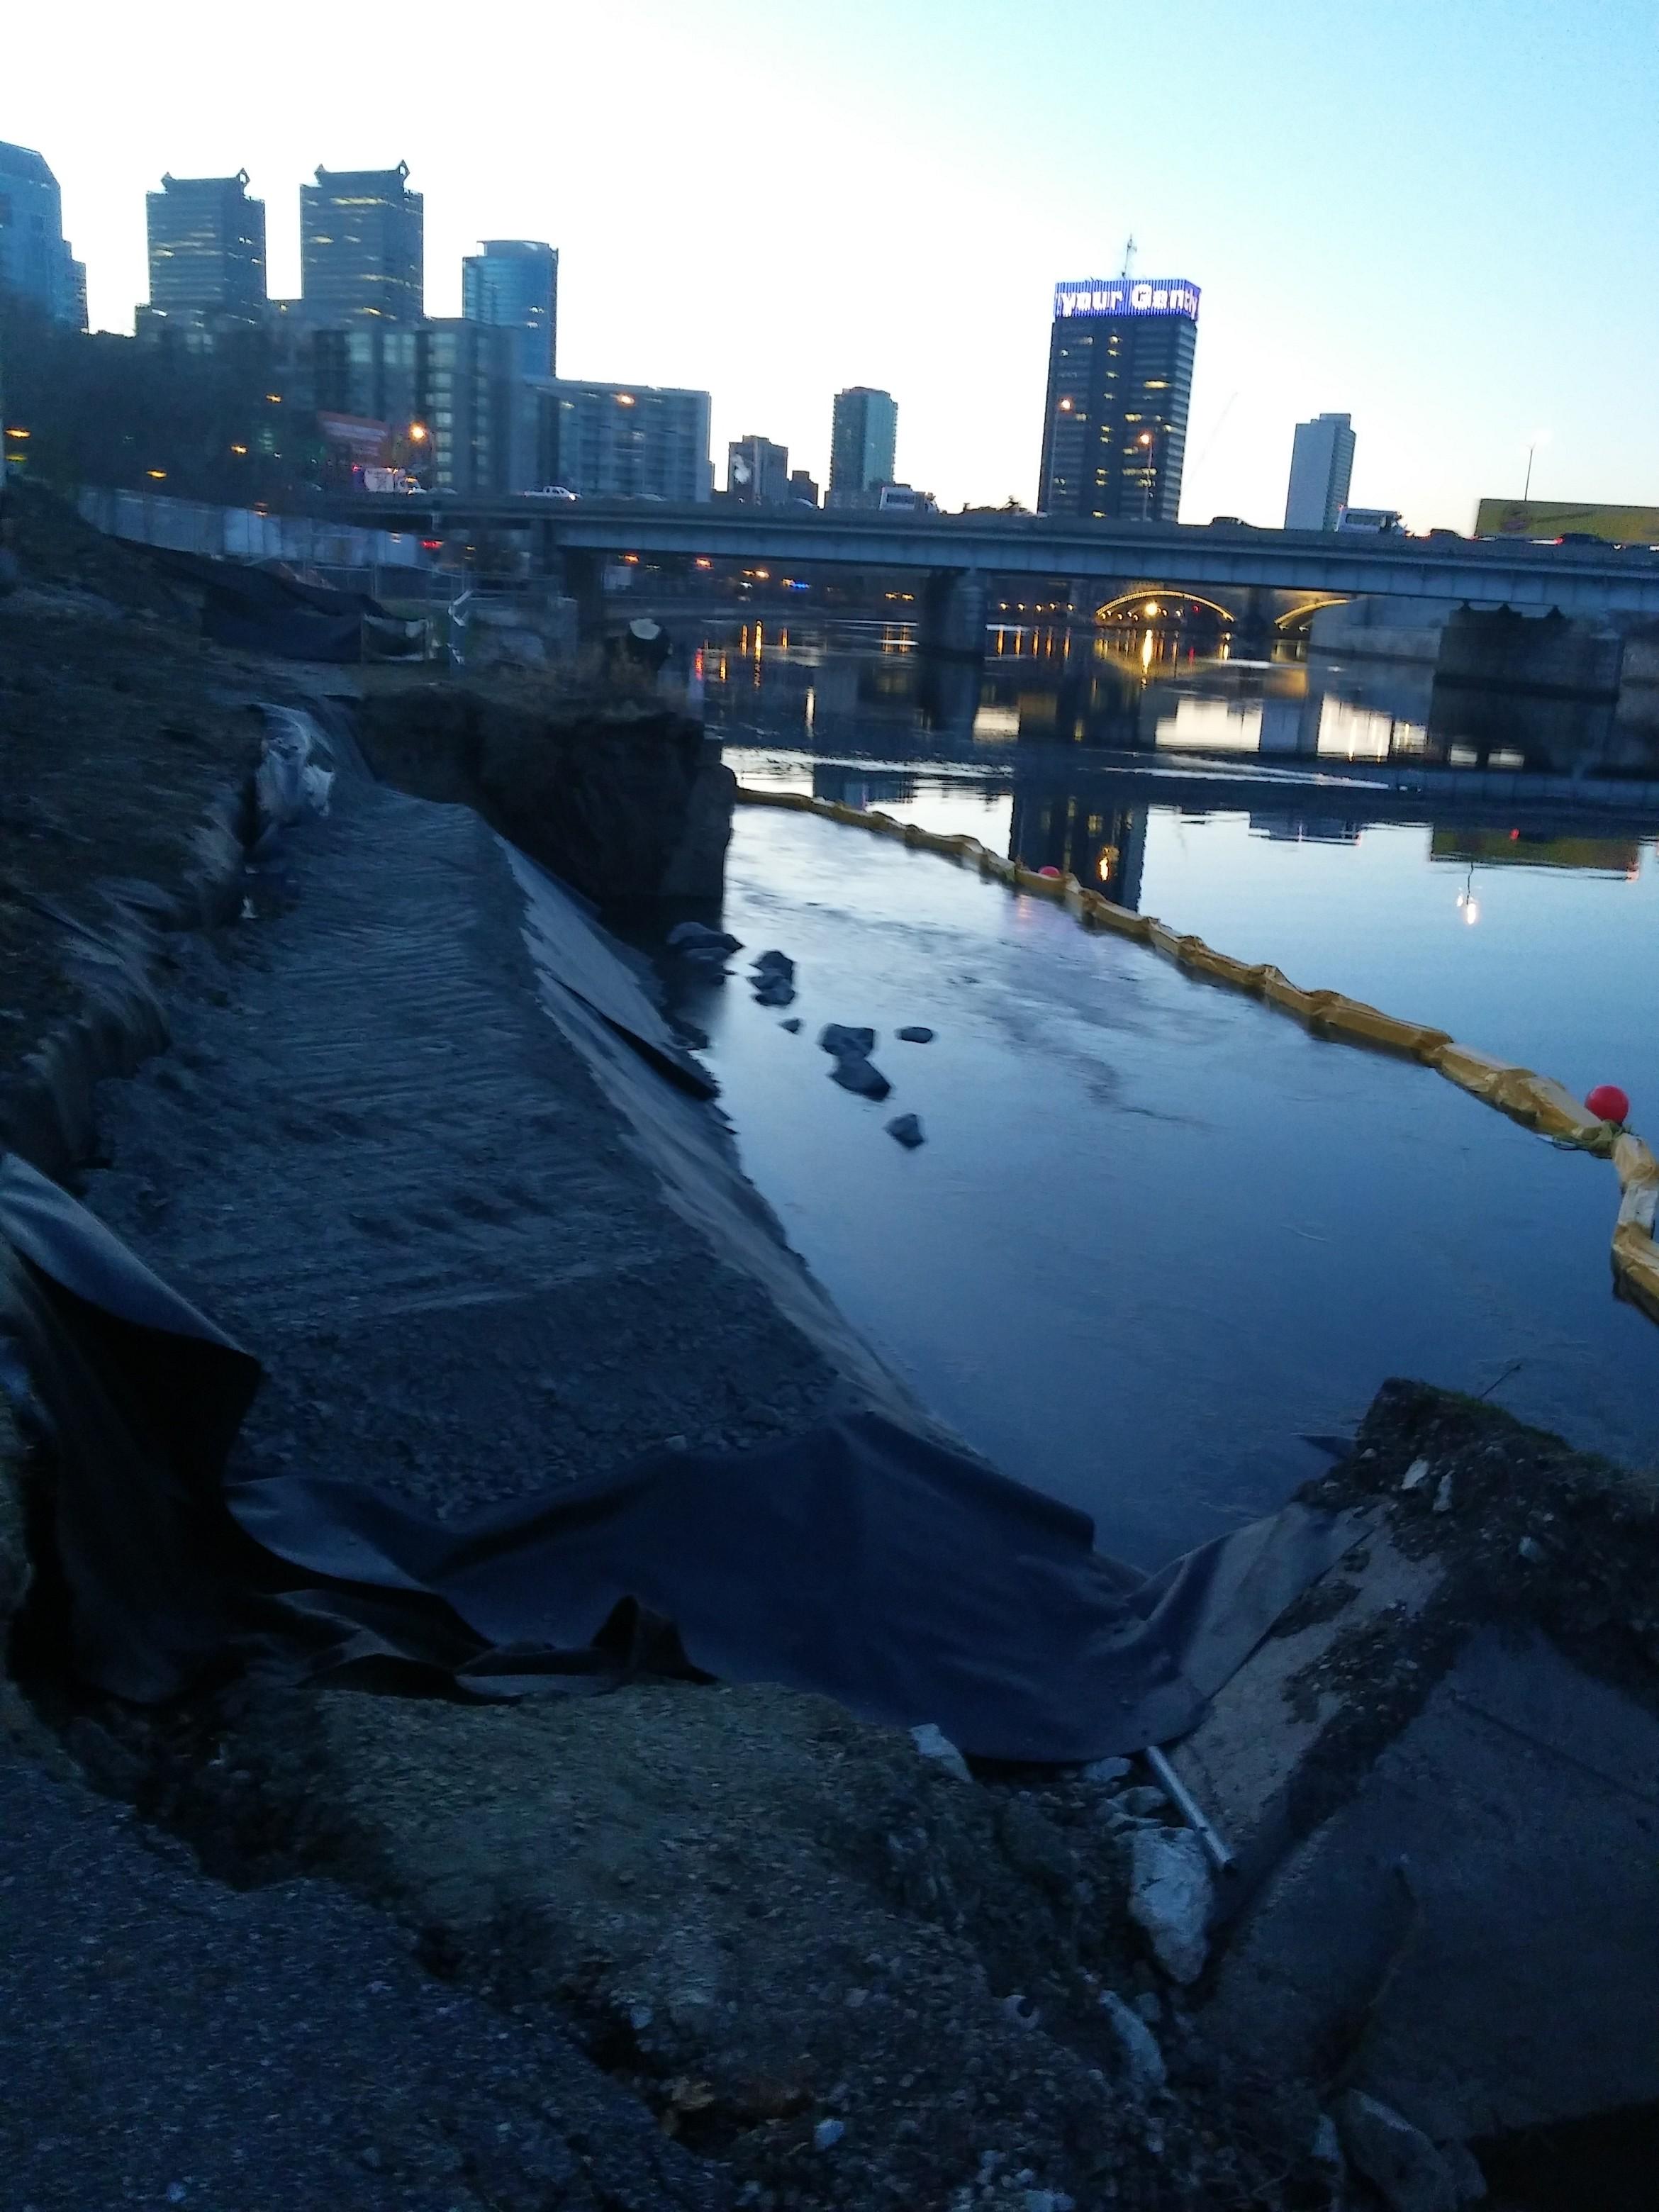 Schuylkill River Wall Repair